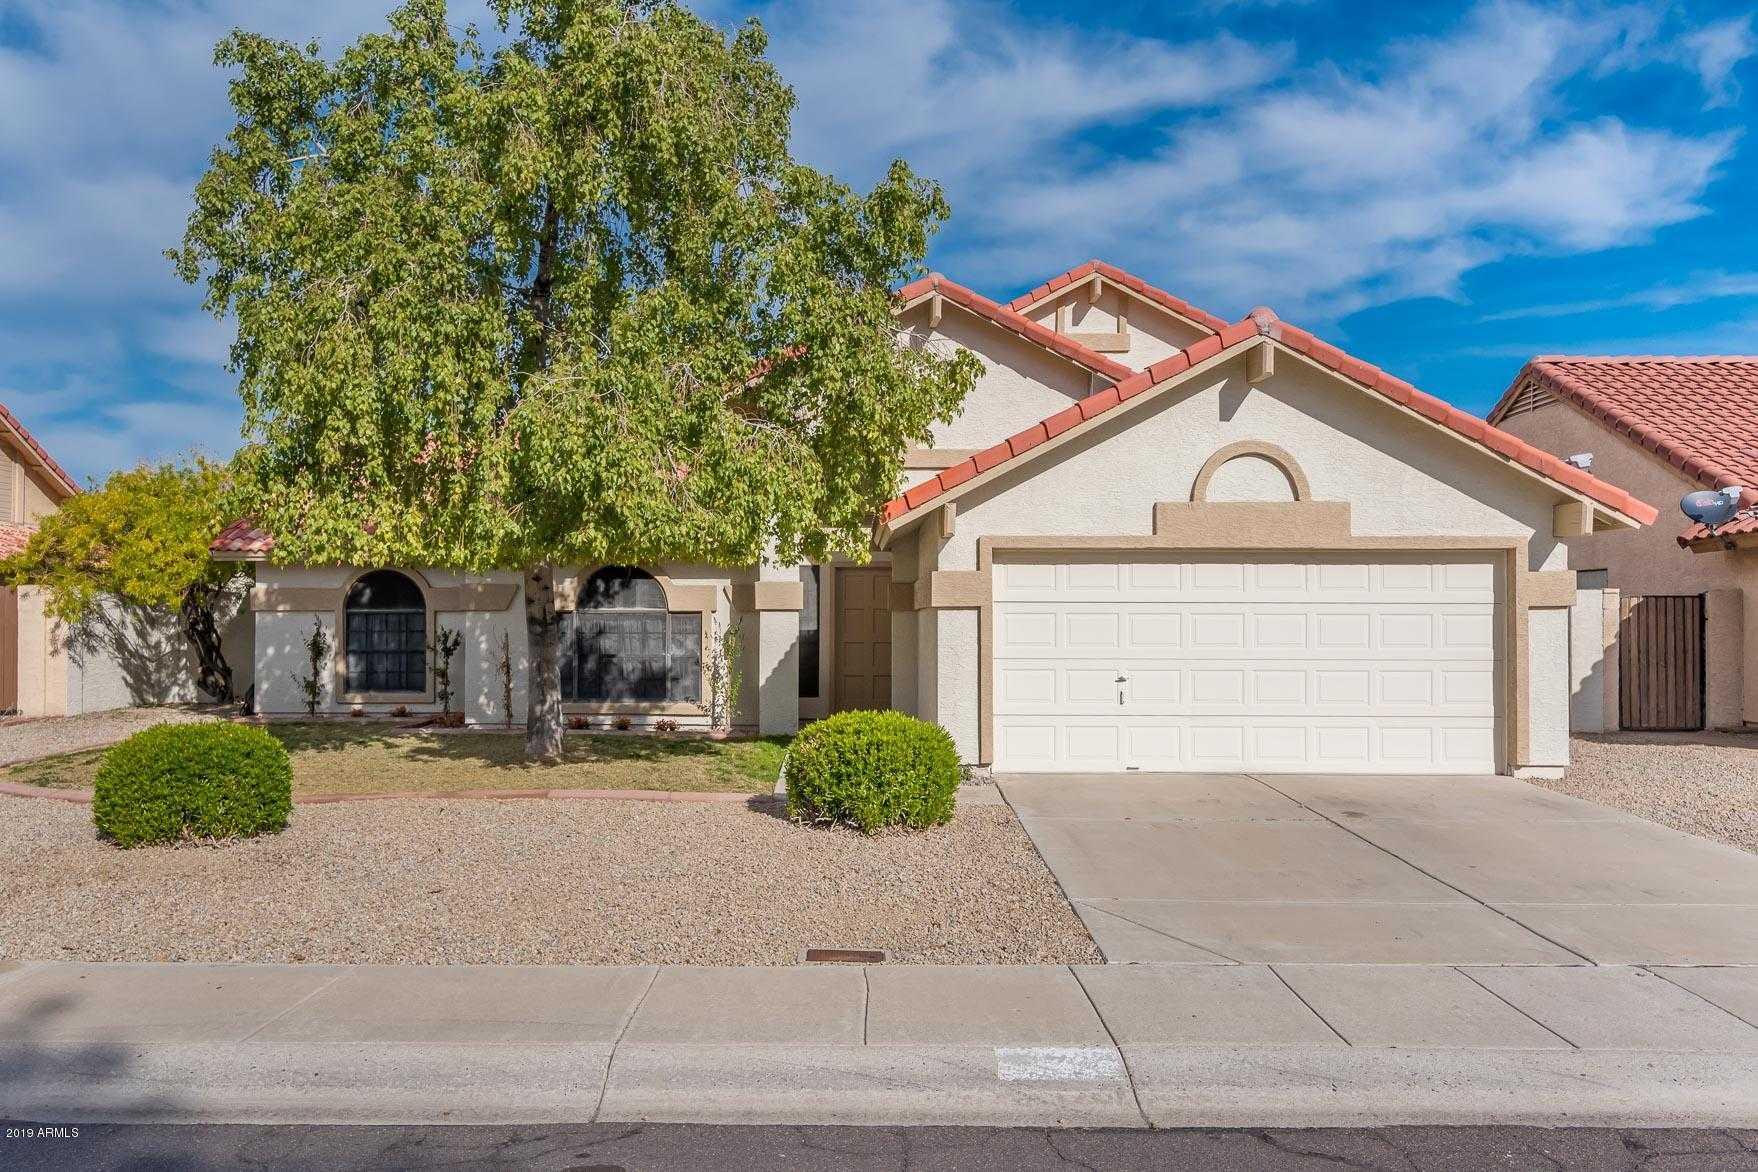 $325,900 - 3Br/3Ba - Home for Sale in Arrowhead Ranch, Glendale